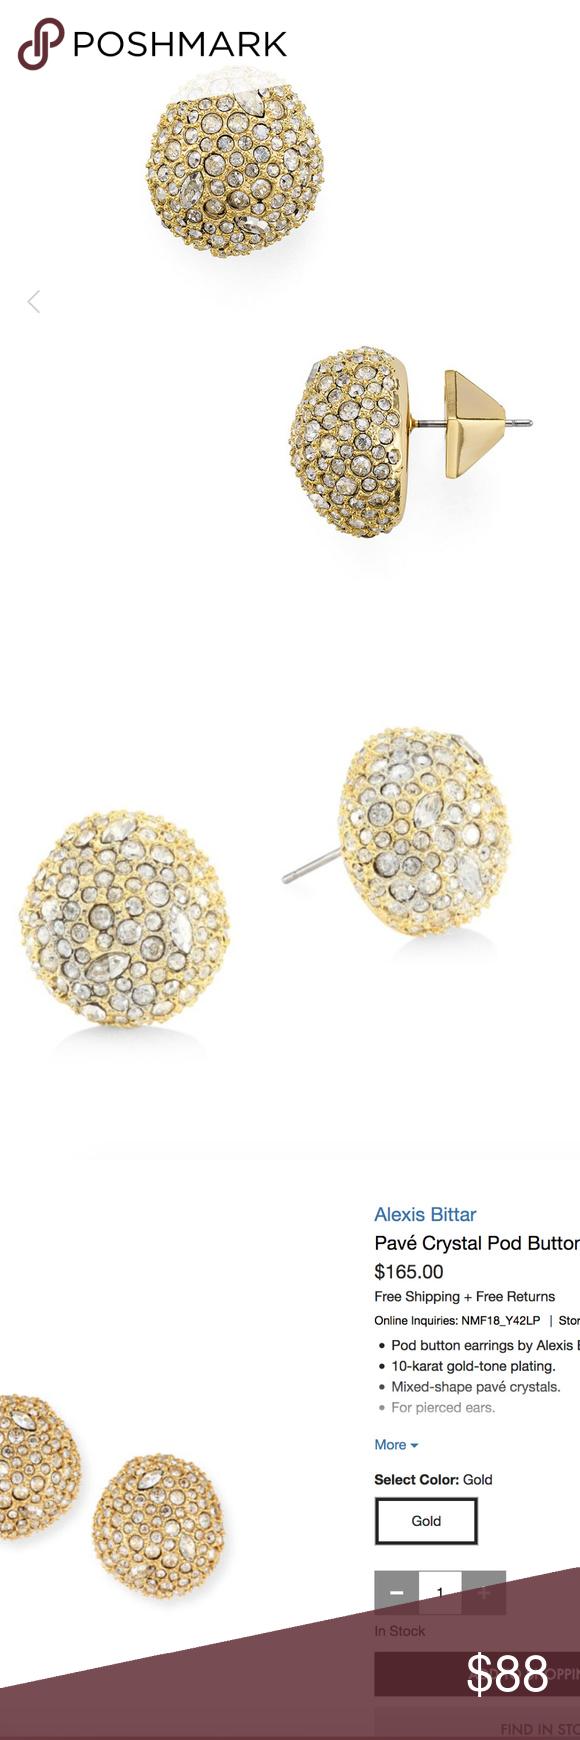 Alexis Bittar Pavé Crystal Pod Button Earrings Z7qFmIlmSV